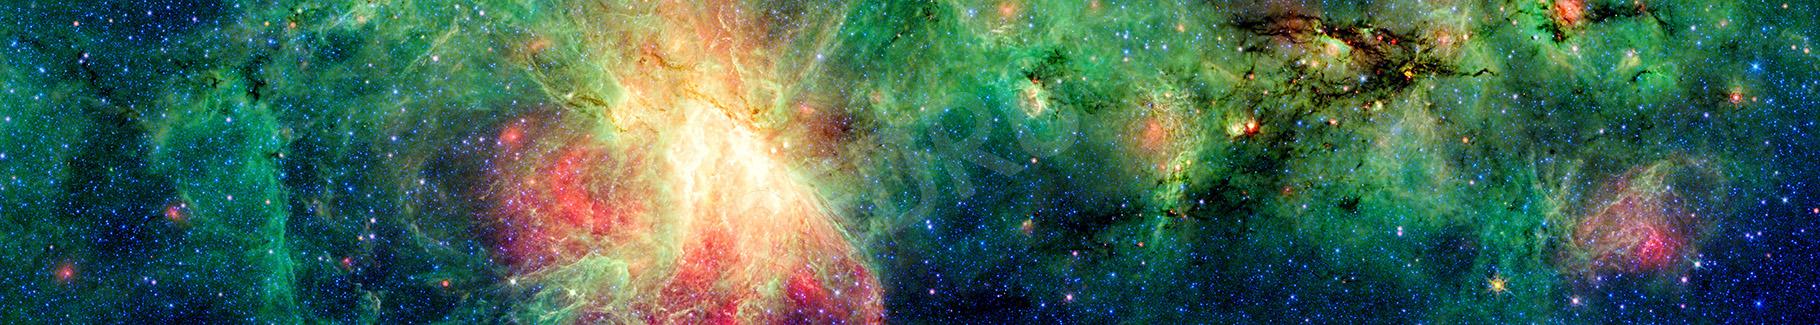 Fototapeta galaktyka NASA